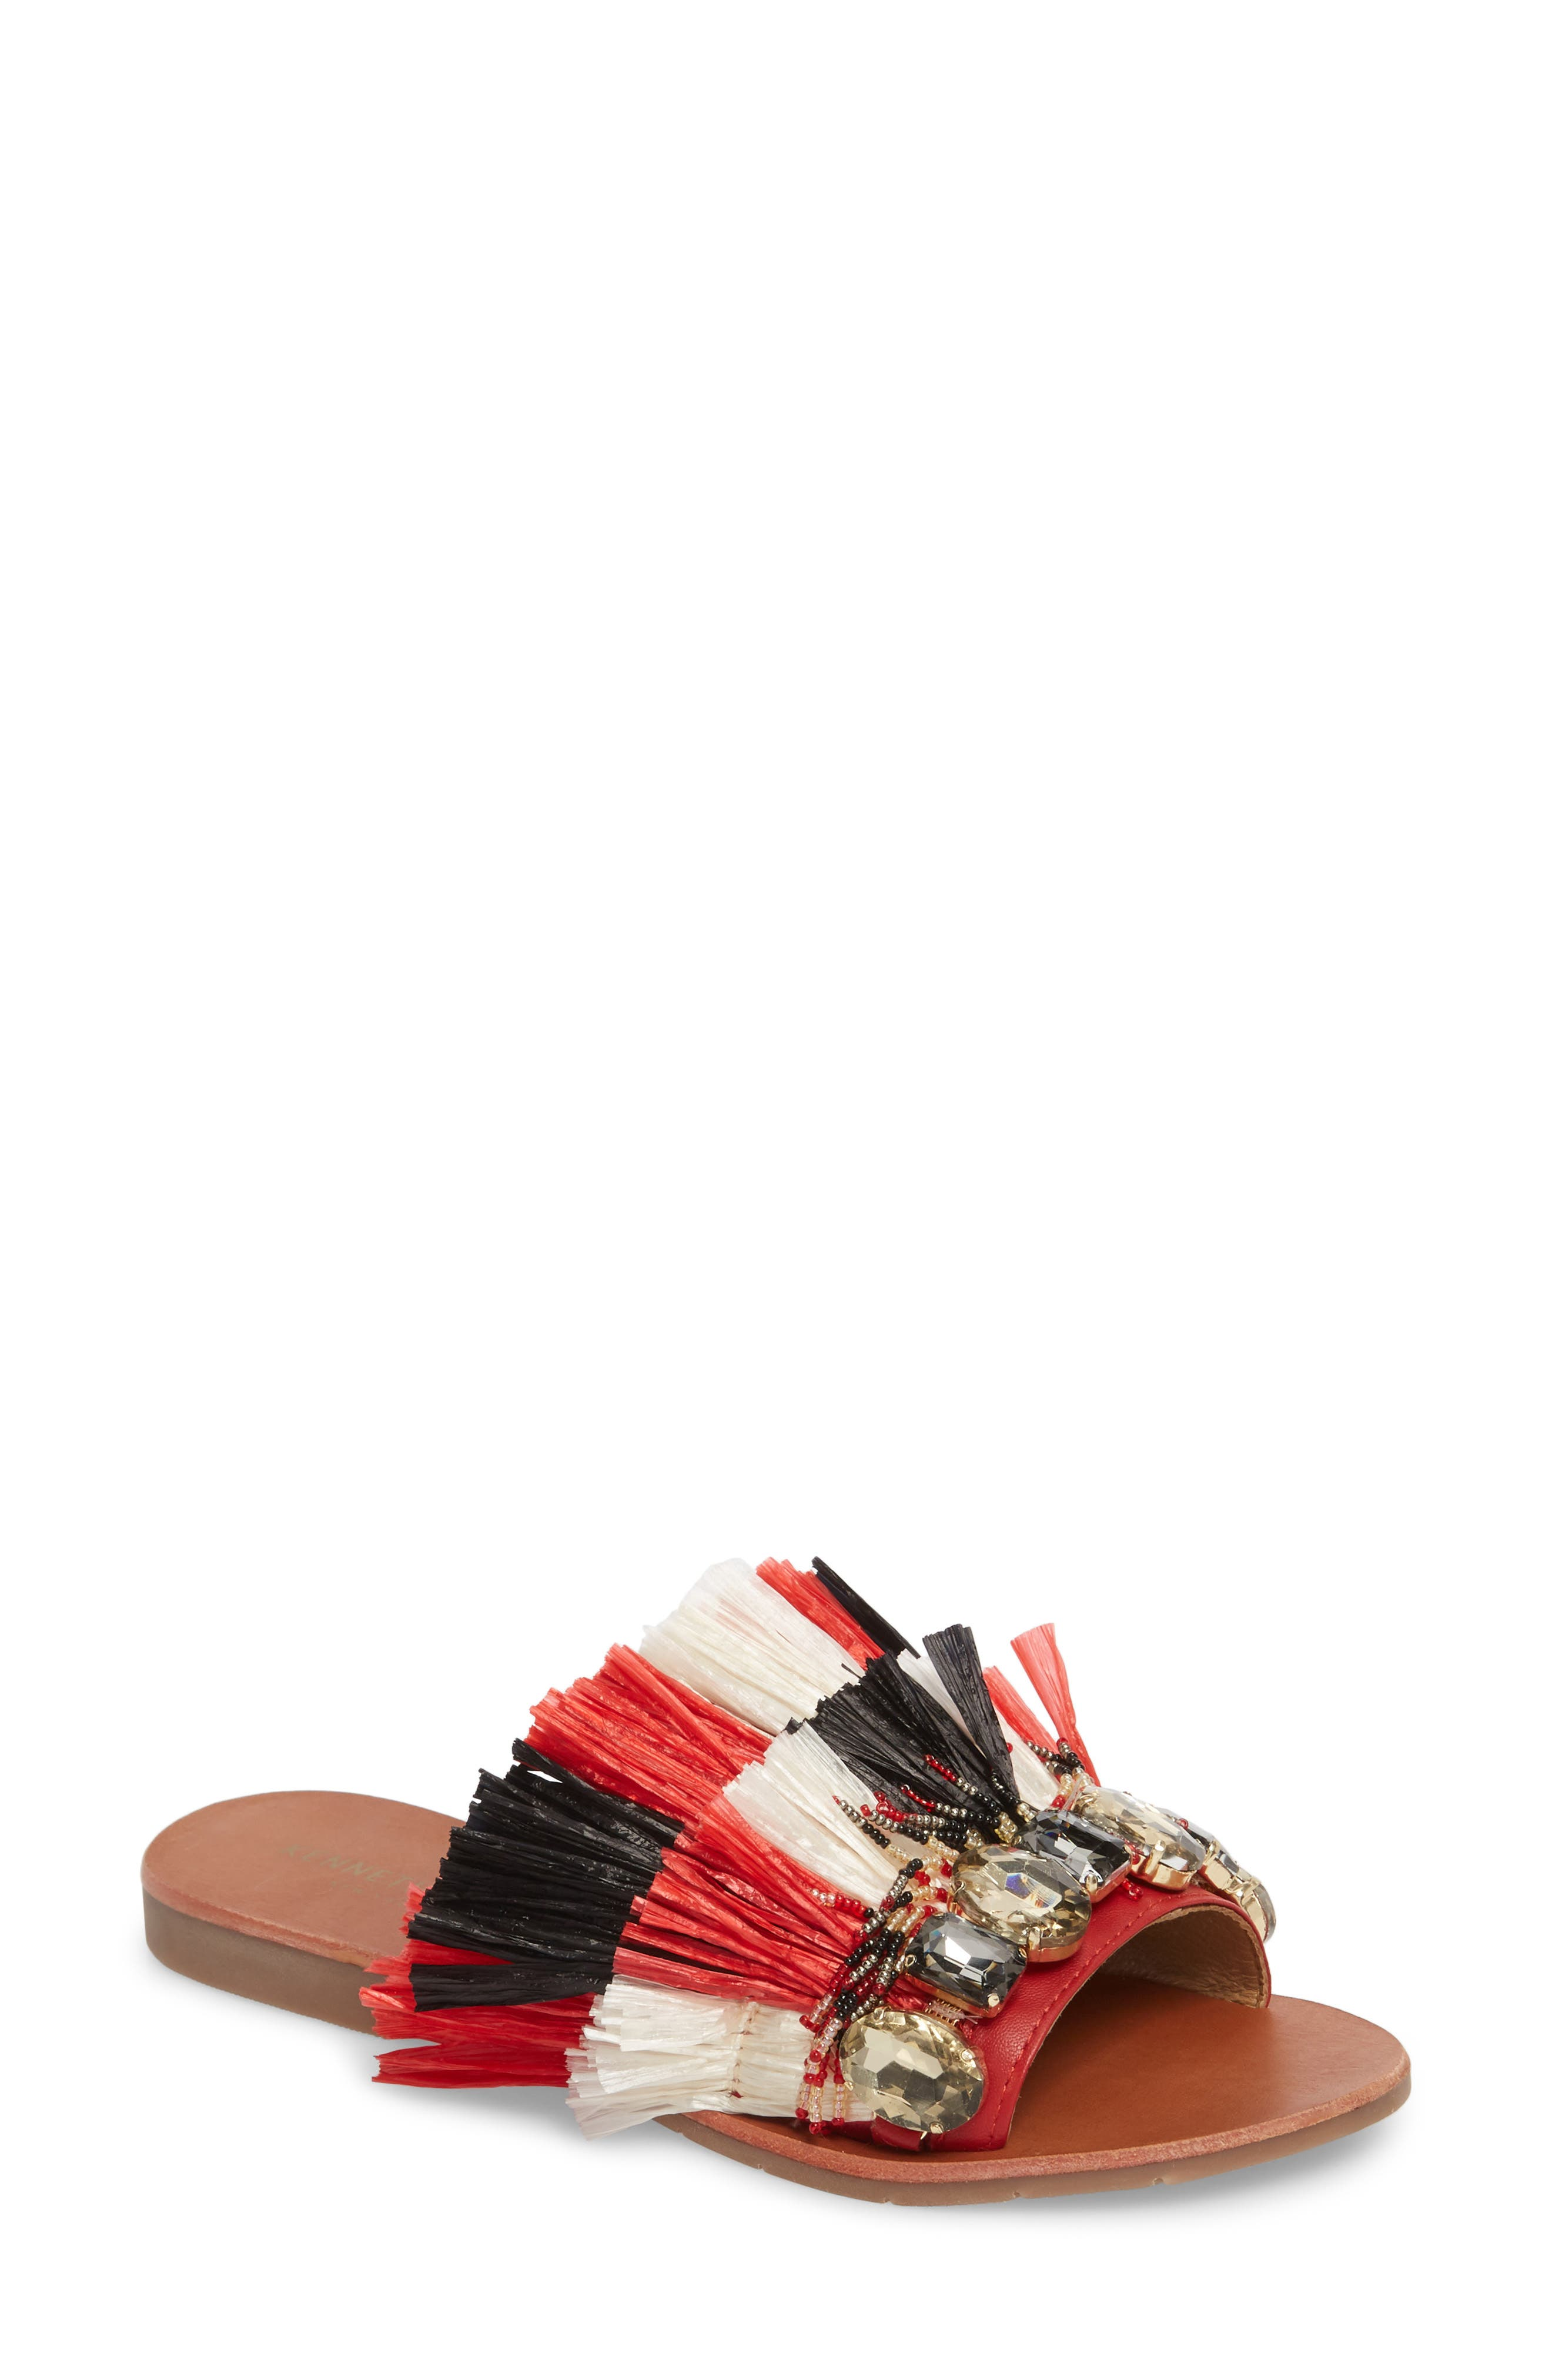 Kenneth Cole New York Women's Heron Slide Sandal Nx3HHas